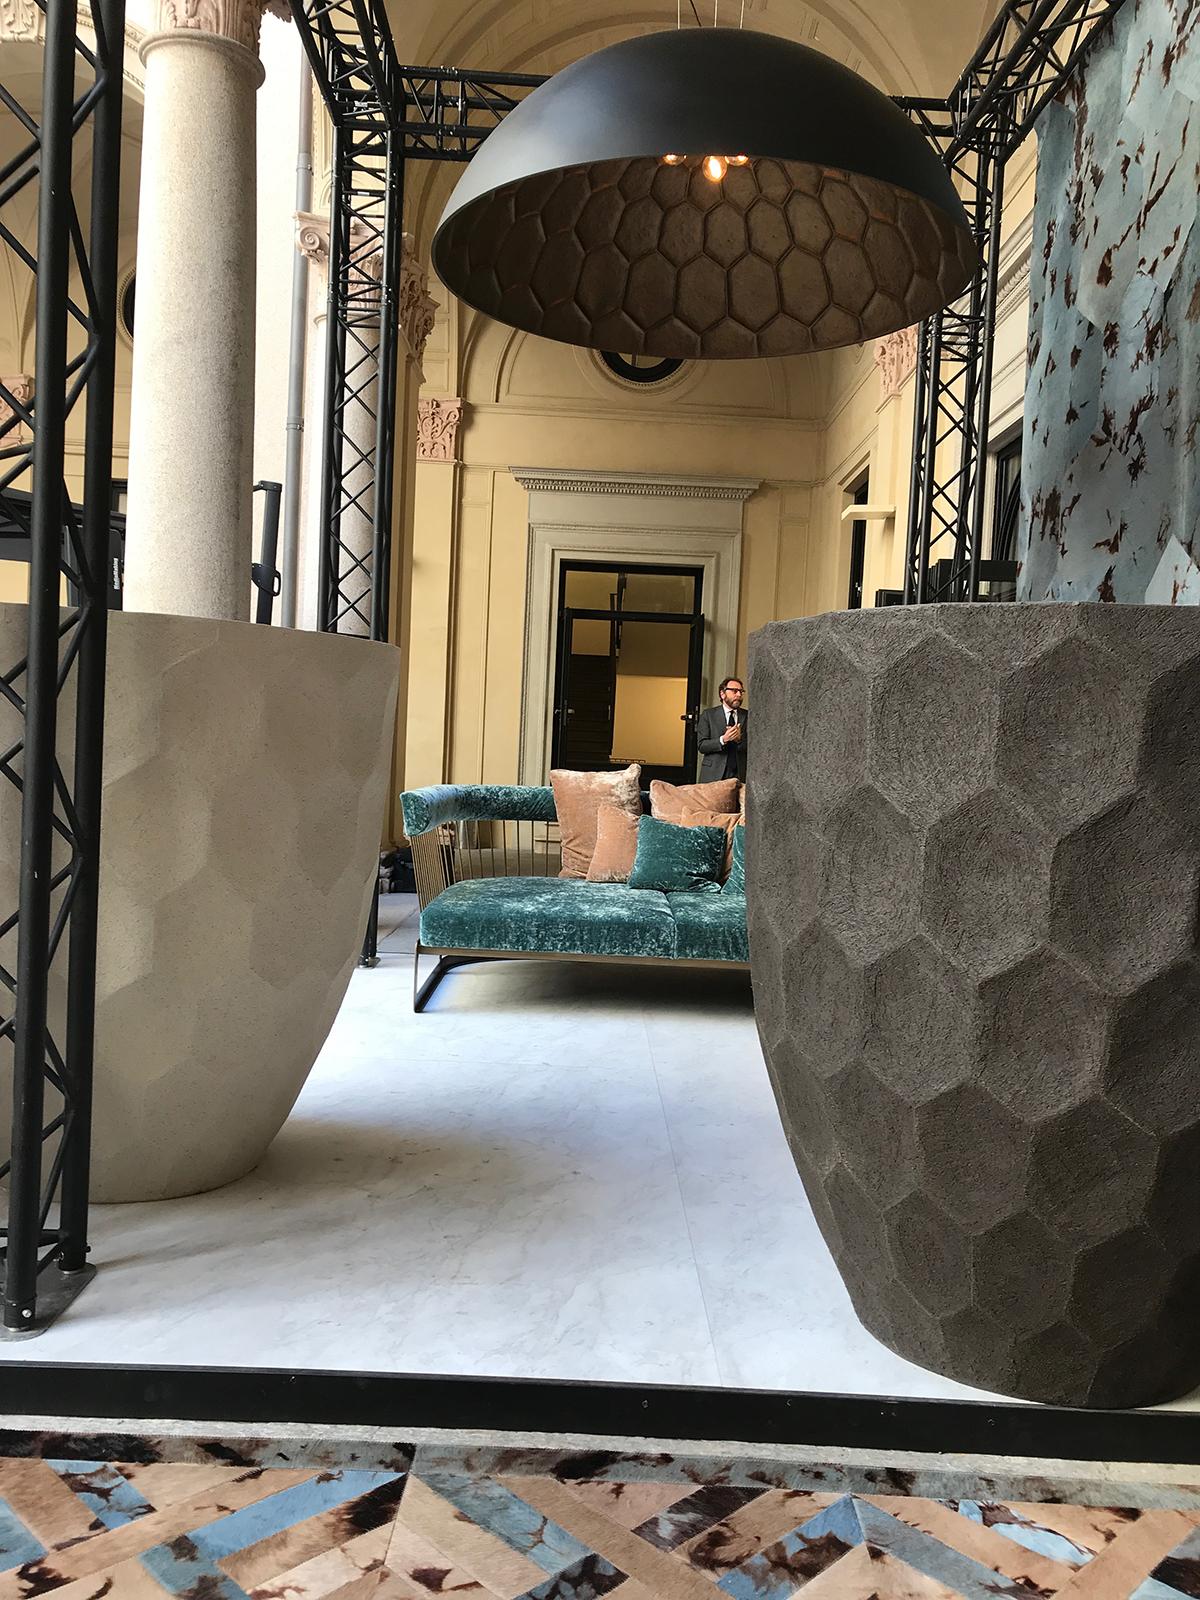 Blog Leem Wonen, Mascha Ekkel, The Art of Living, Club Unseen, Masterly, Osiris Hertman